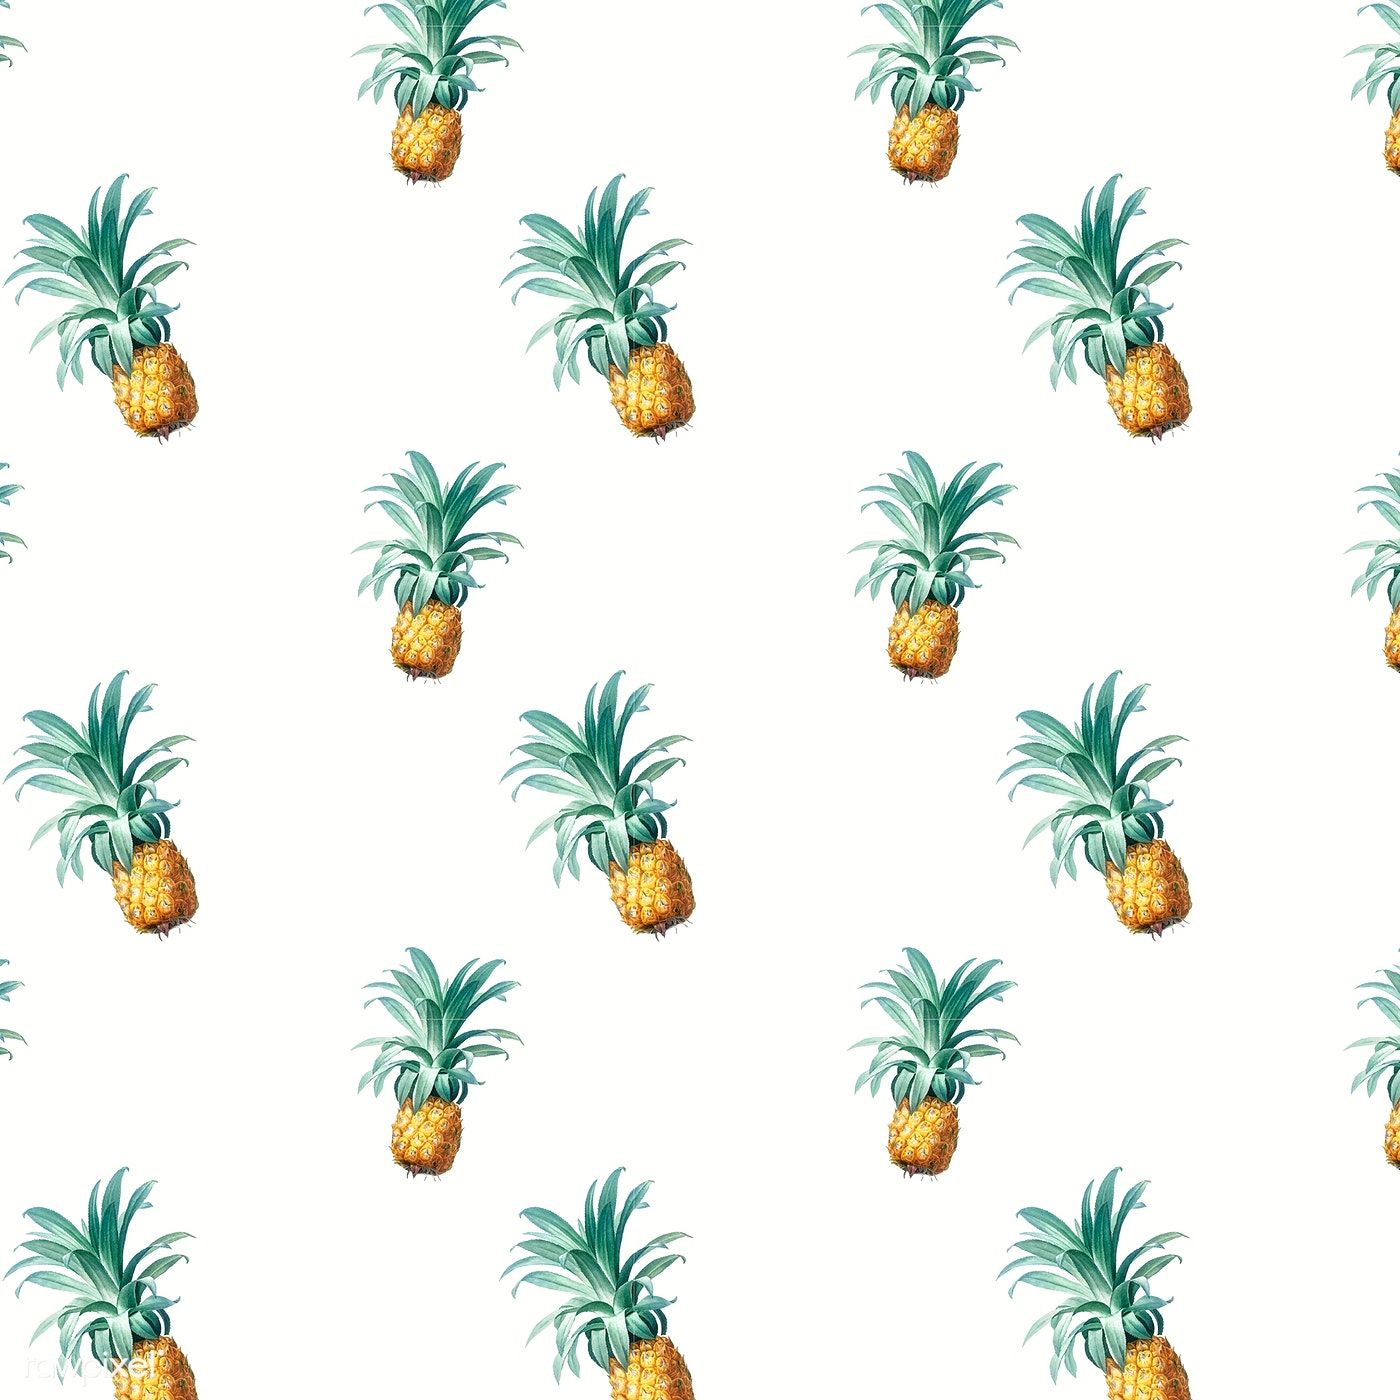 Tropical pineapple wallpaper vintage illustration | free ...